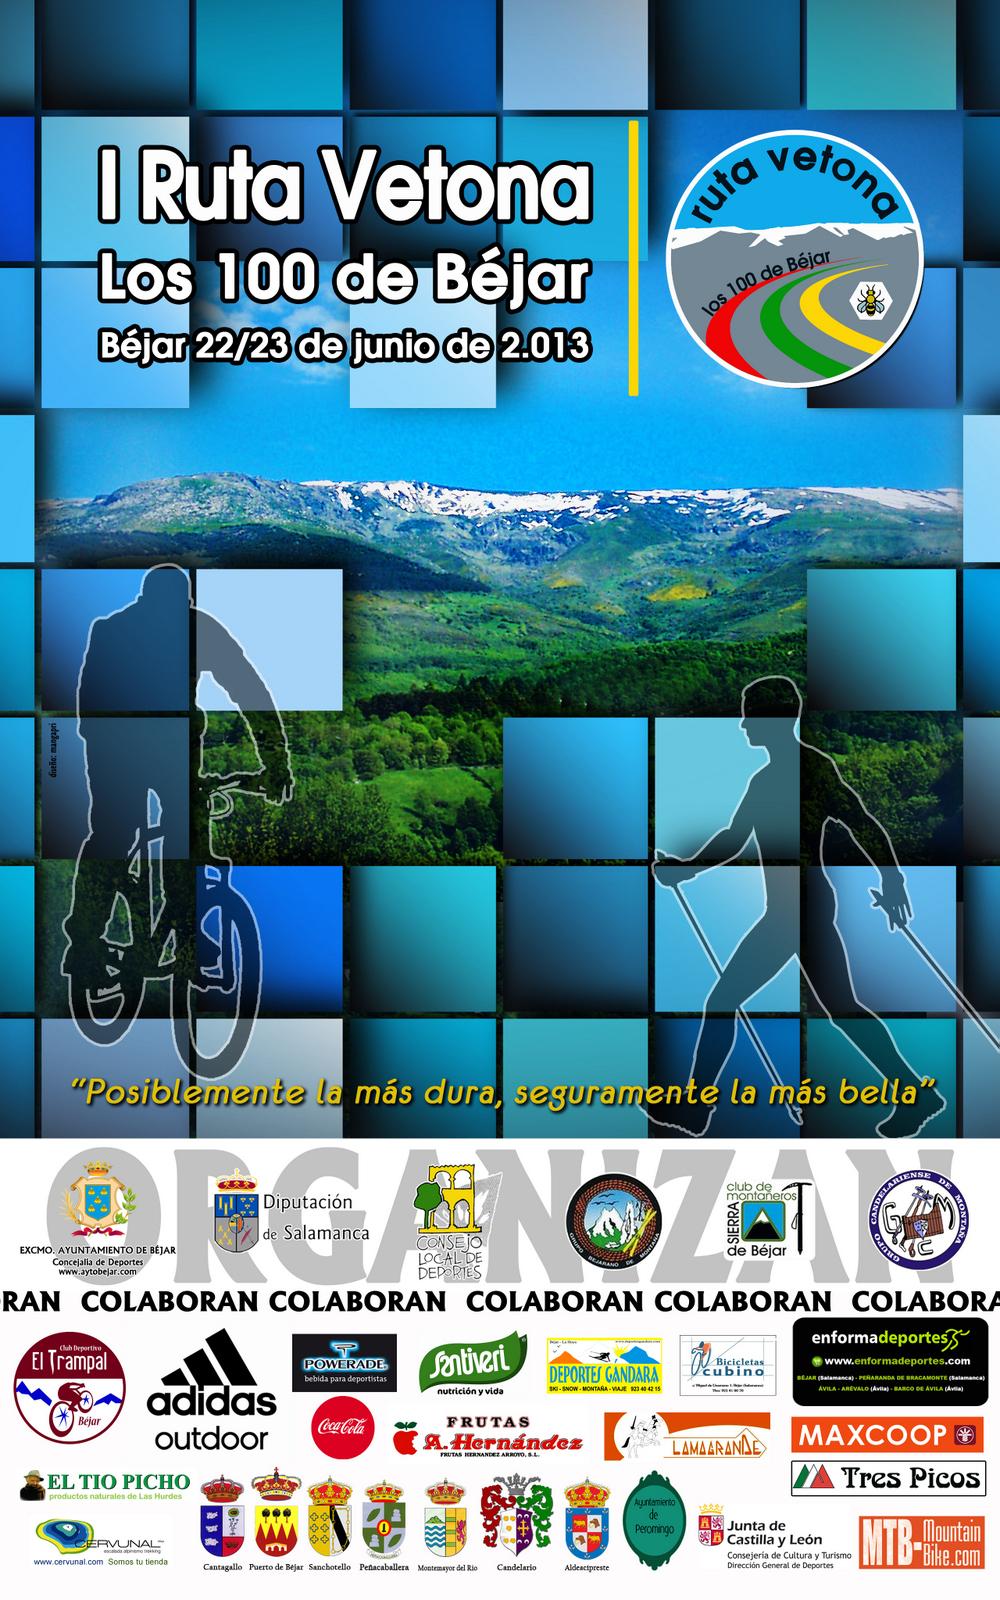 Cartel de la I Ruta Vetona Junuio de 2013